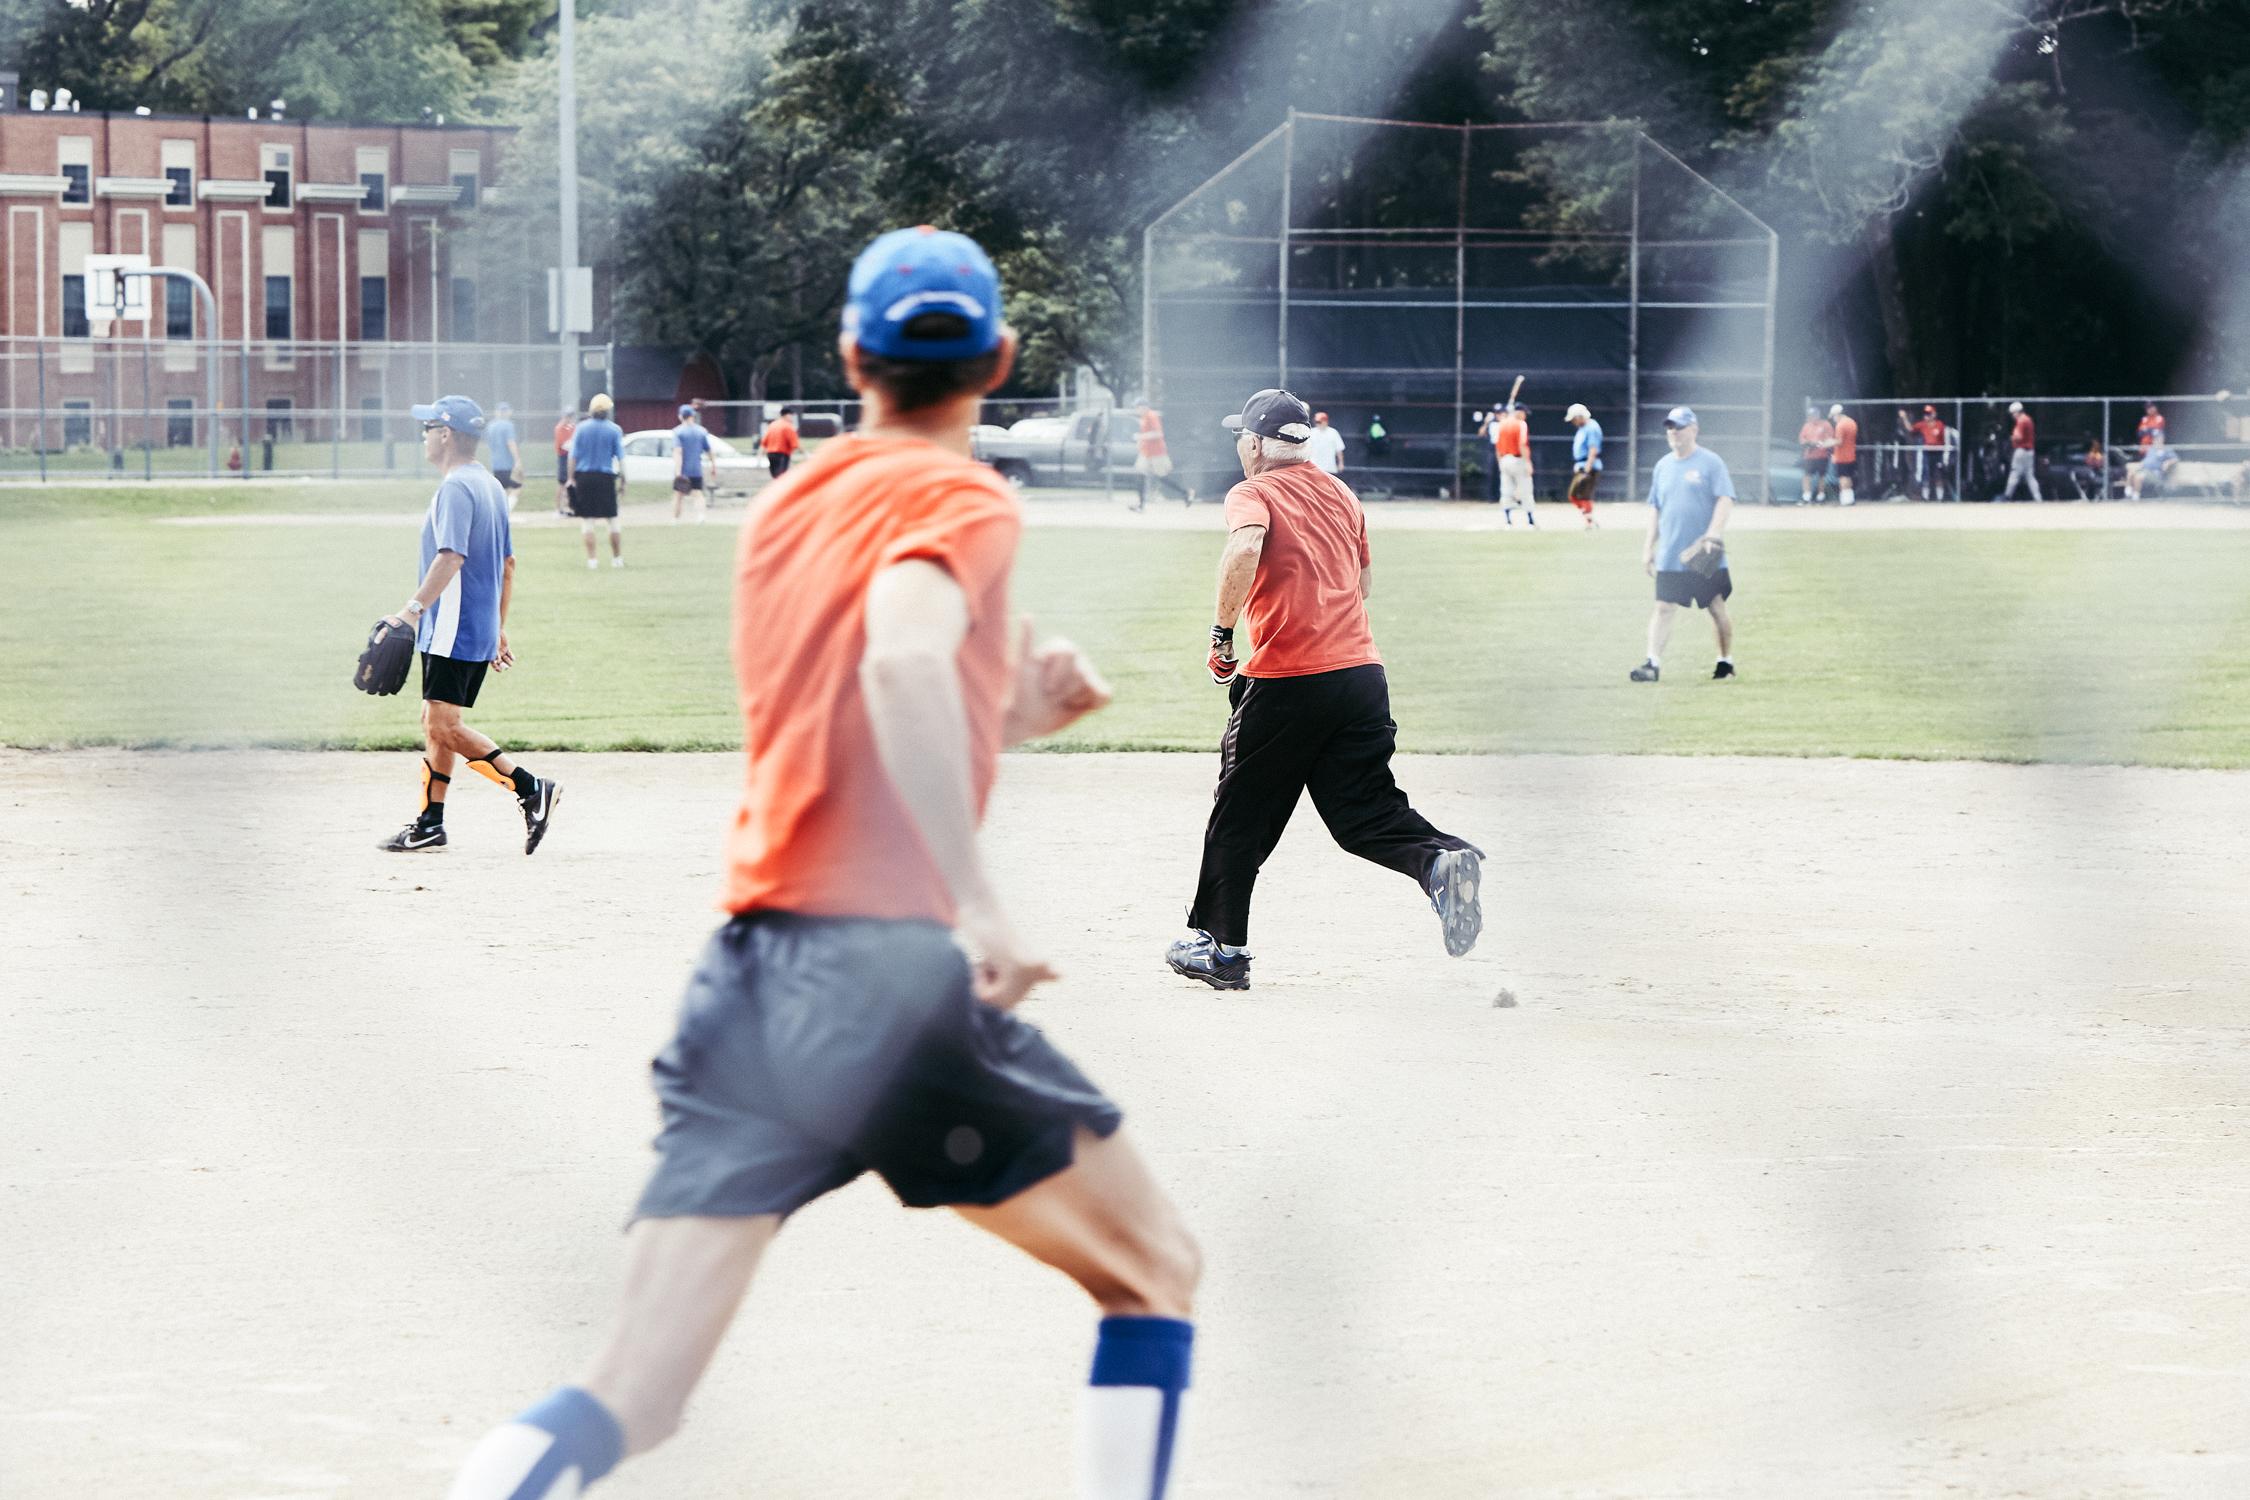 softball_10.jpg